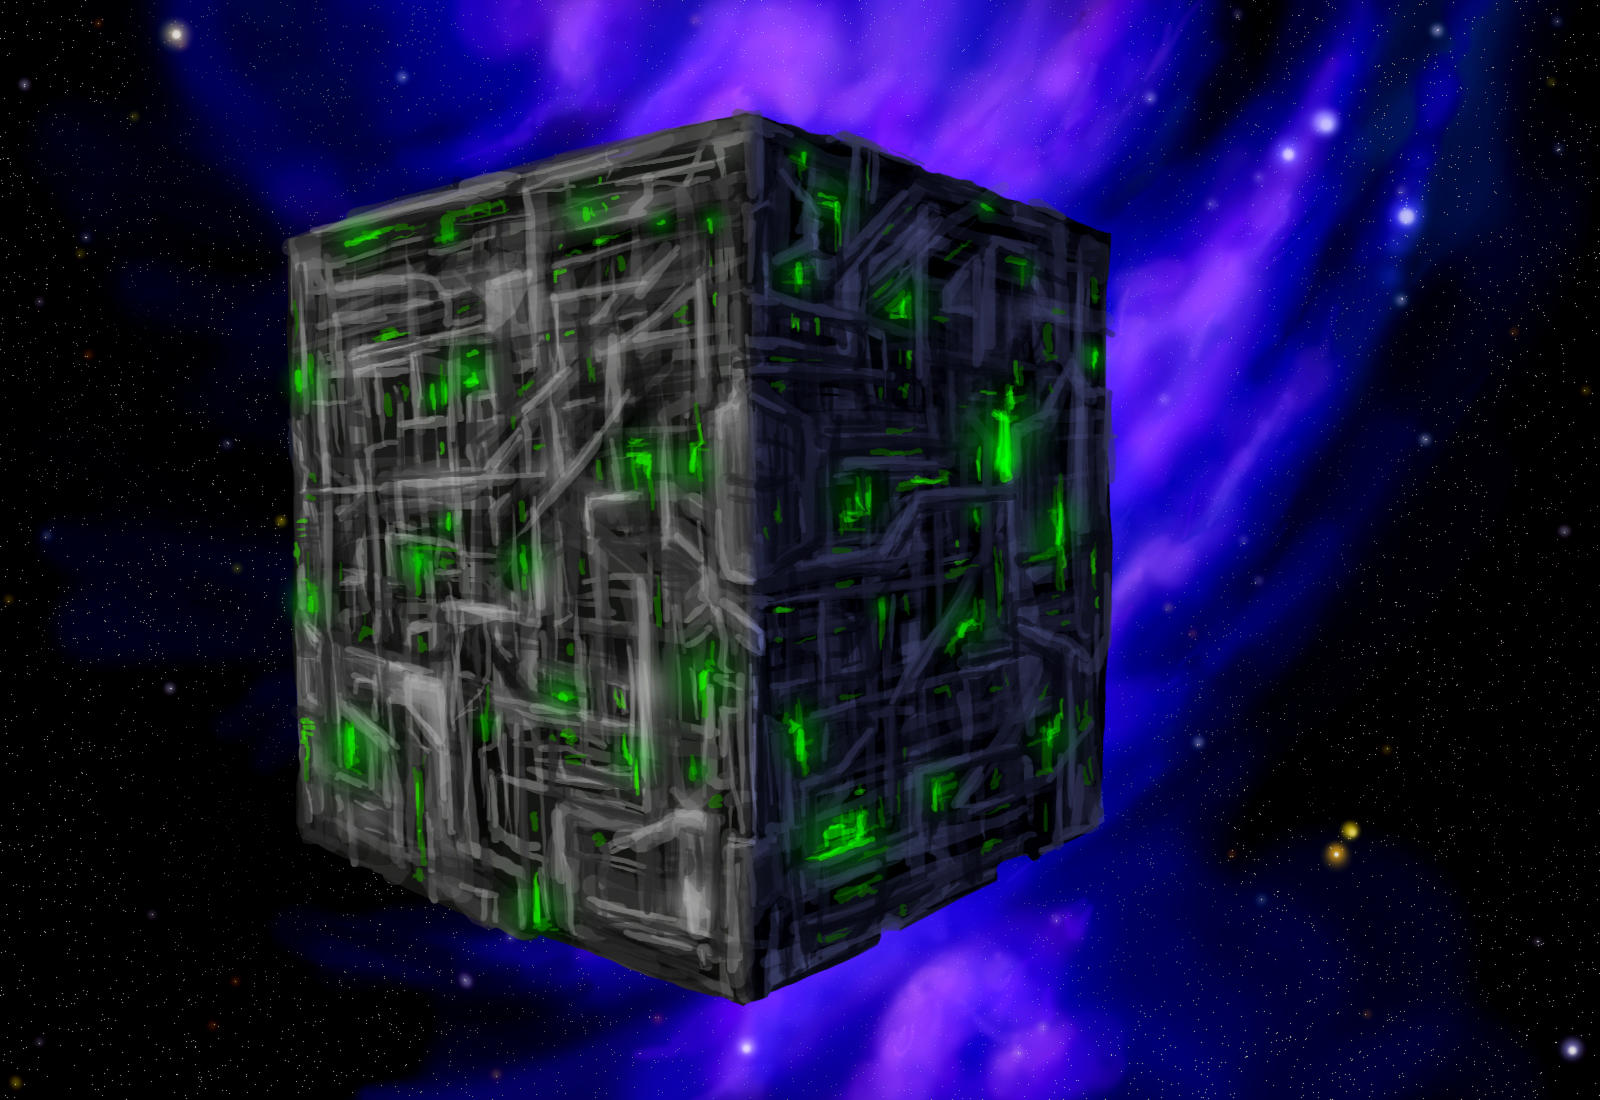 Rubik's Nightmare by DeepChrome